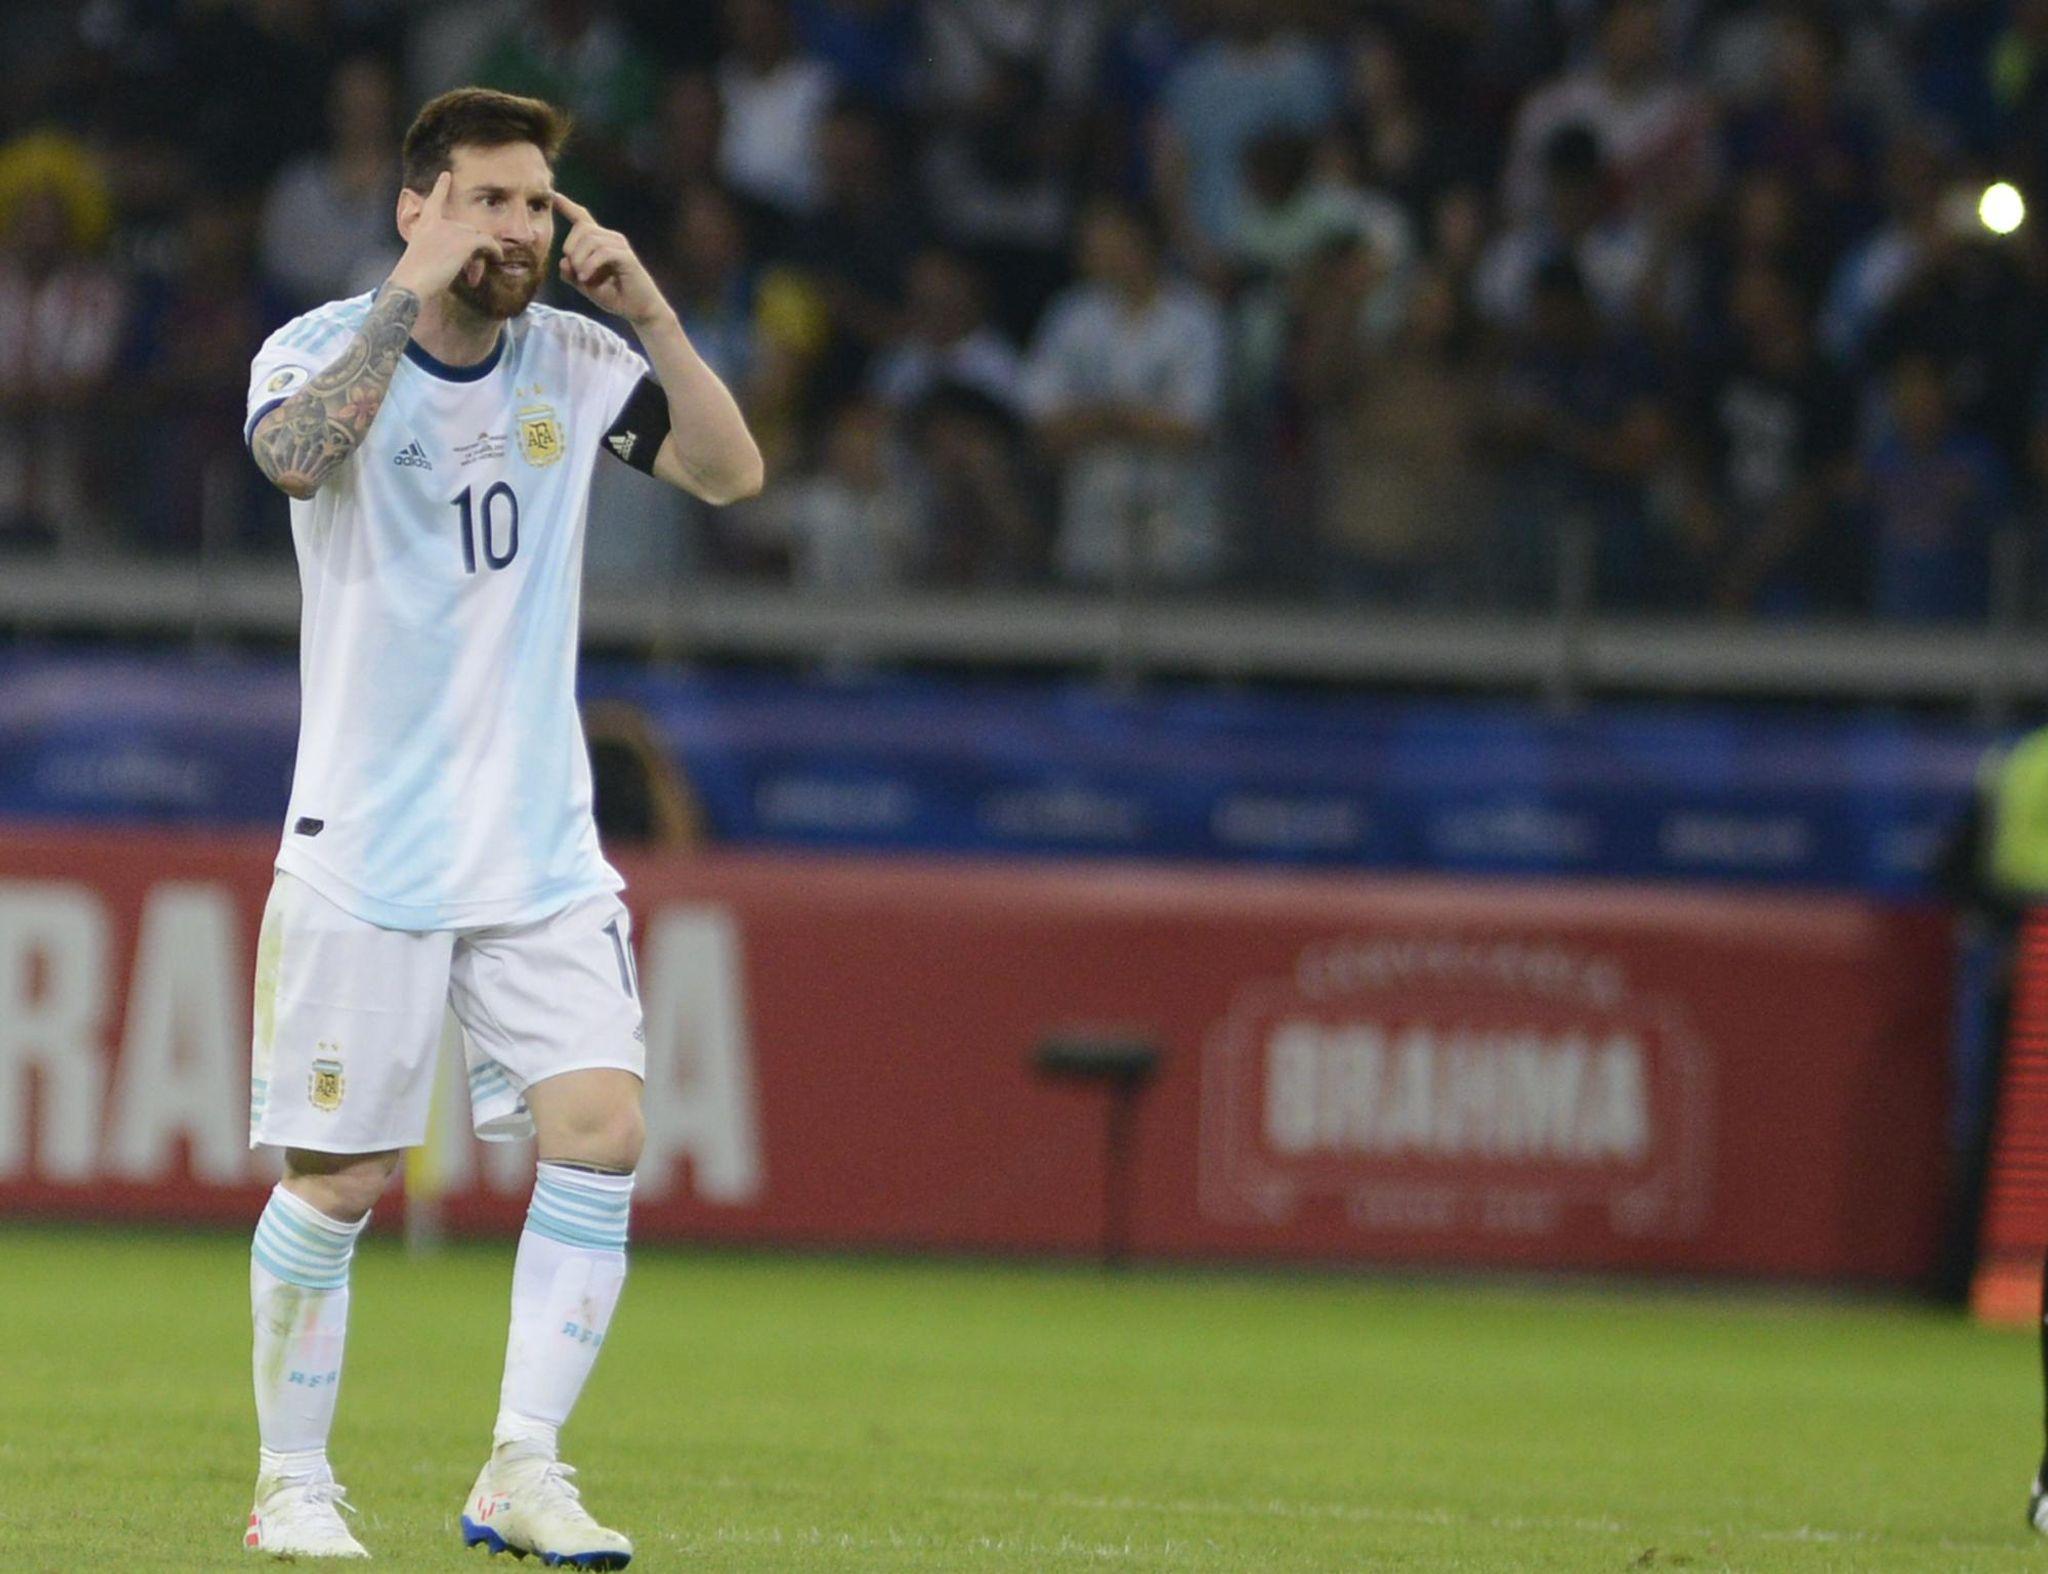 Brazil_soccer_copa_america_argentina_paraguay_66298_s2048x1574